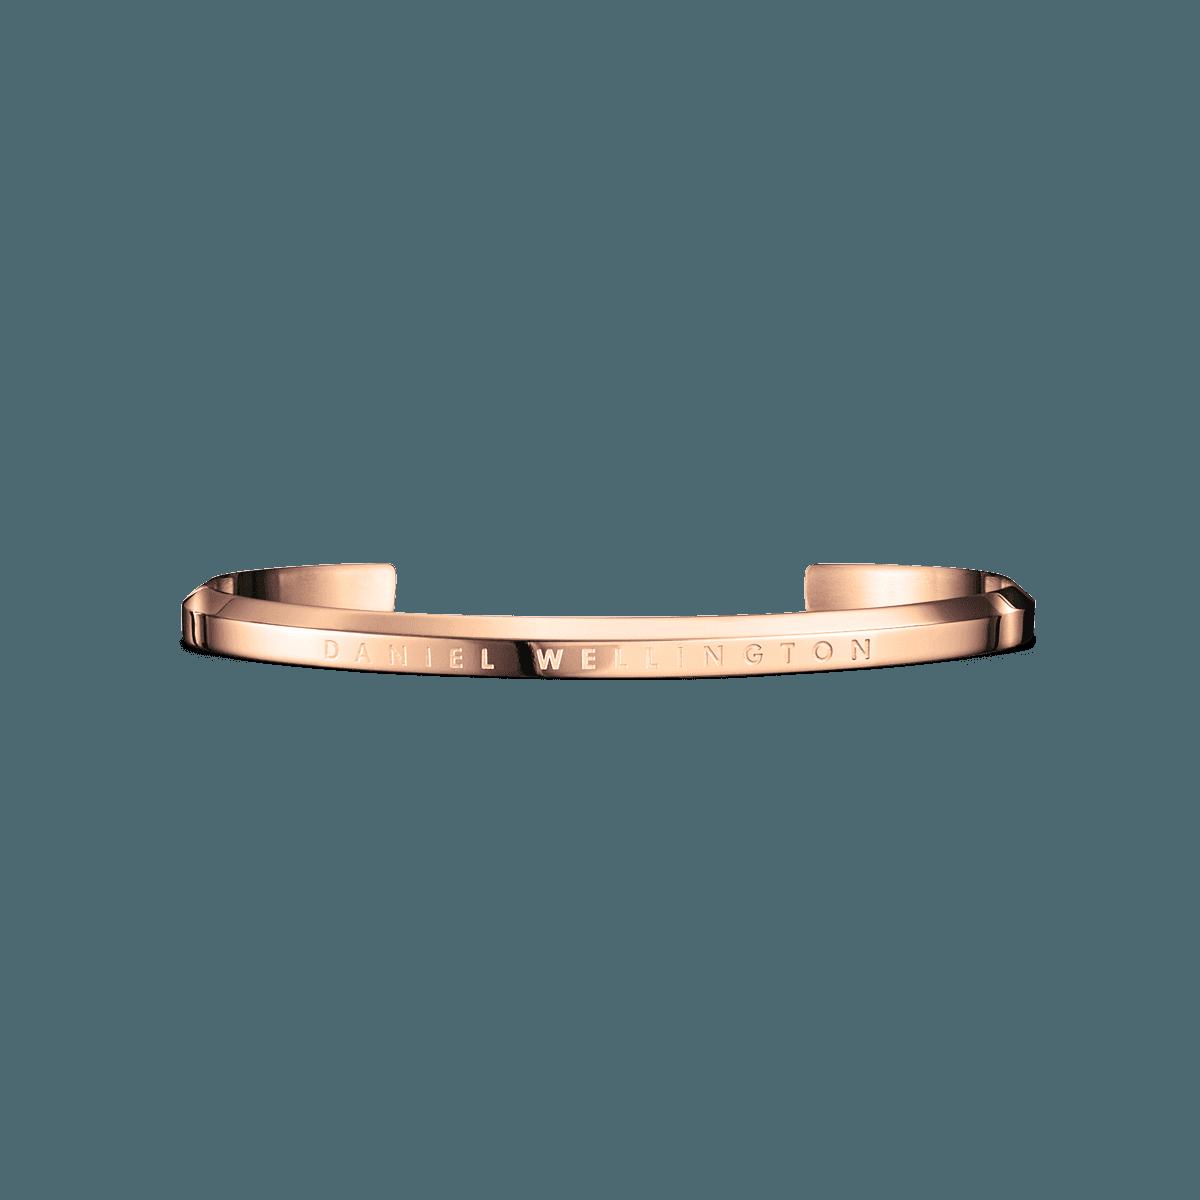 dw官网 dw手表官网 dw中国官网 dw官方旗舰店 DW DW官网  Bundle W+B Petite Black Bondi RG 32mm+Classic Bracelet RG S